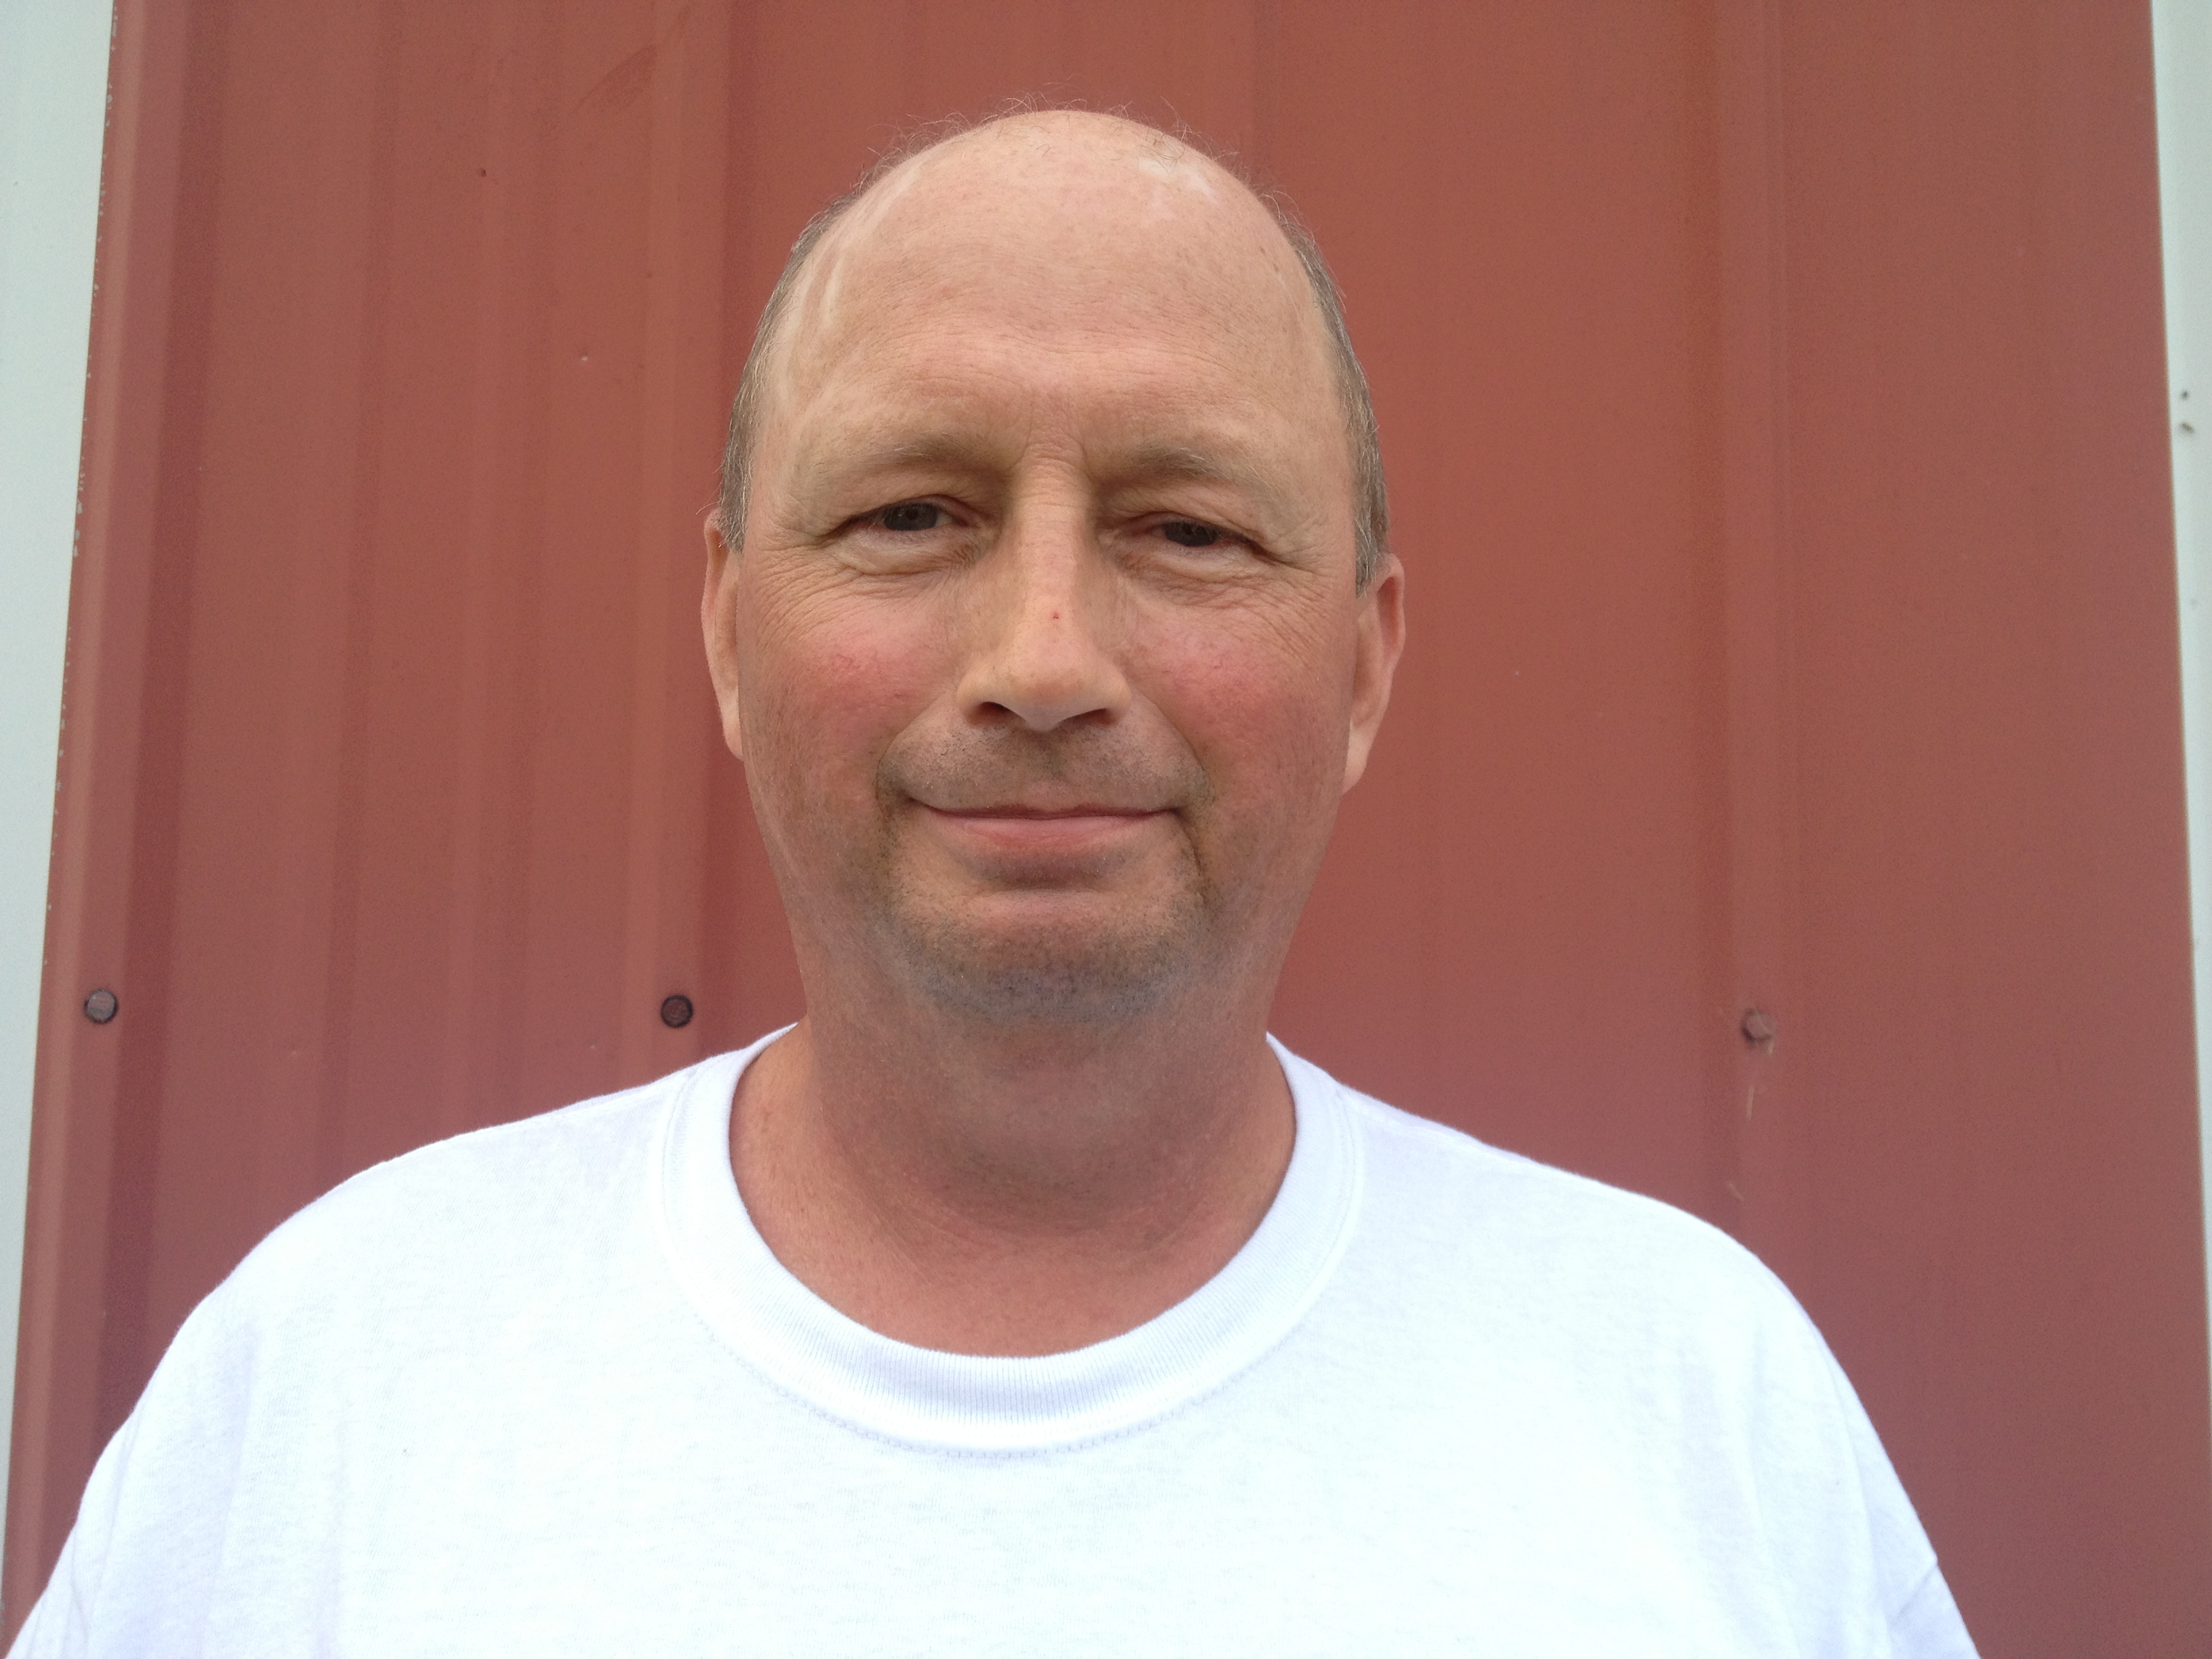 Brian Hapka